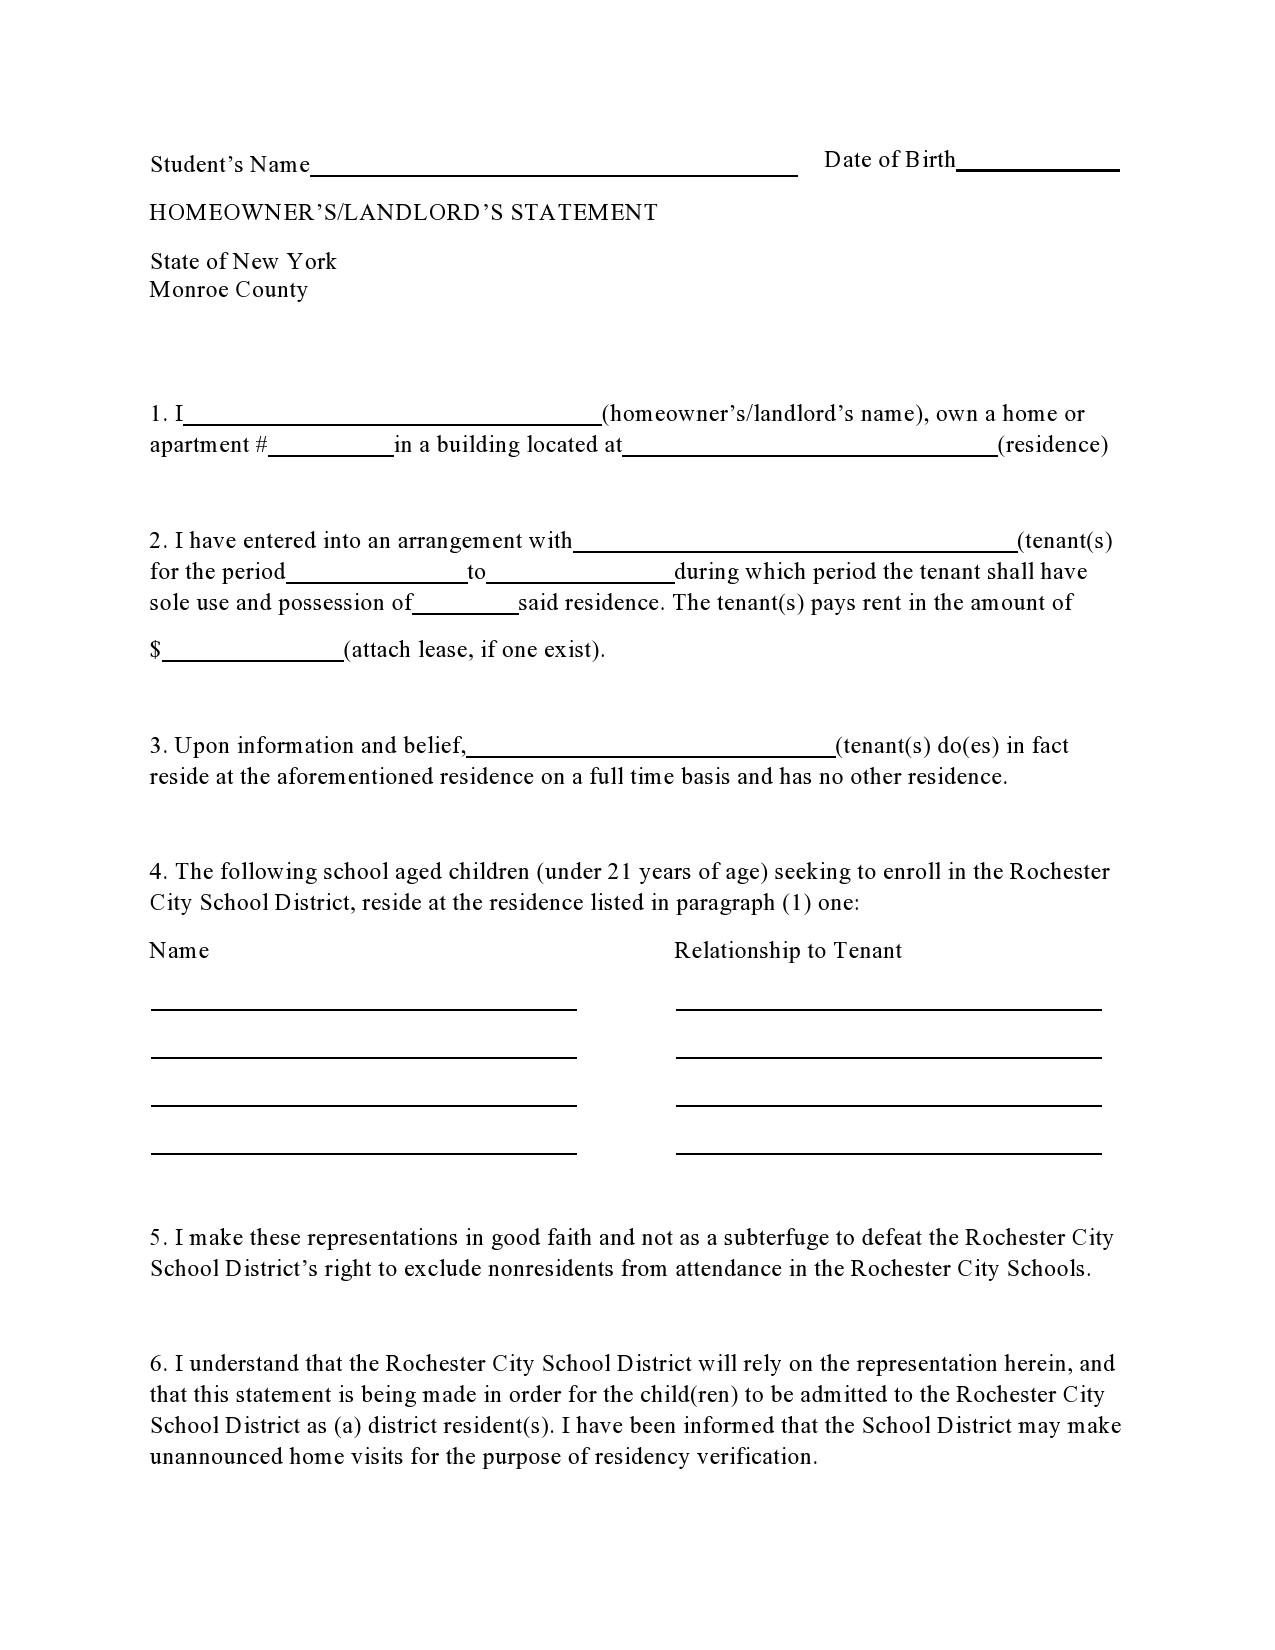 Free landlord statment 10